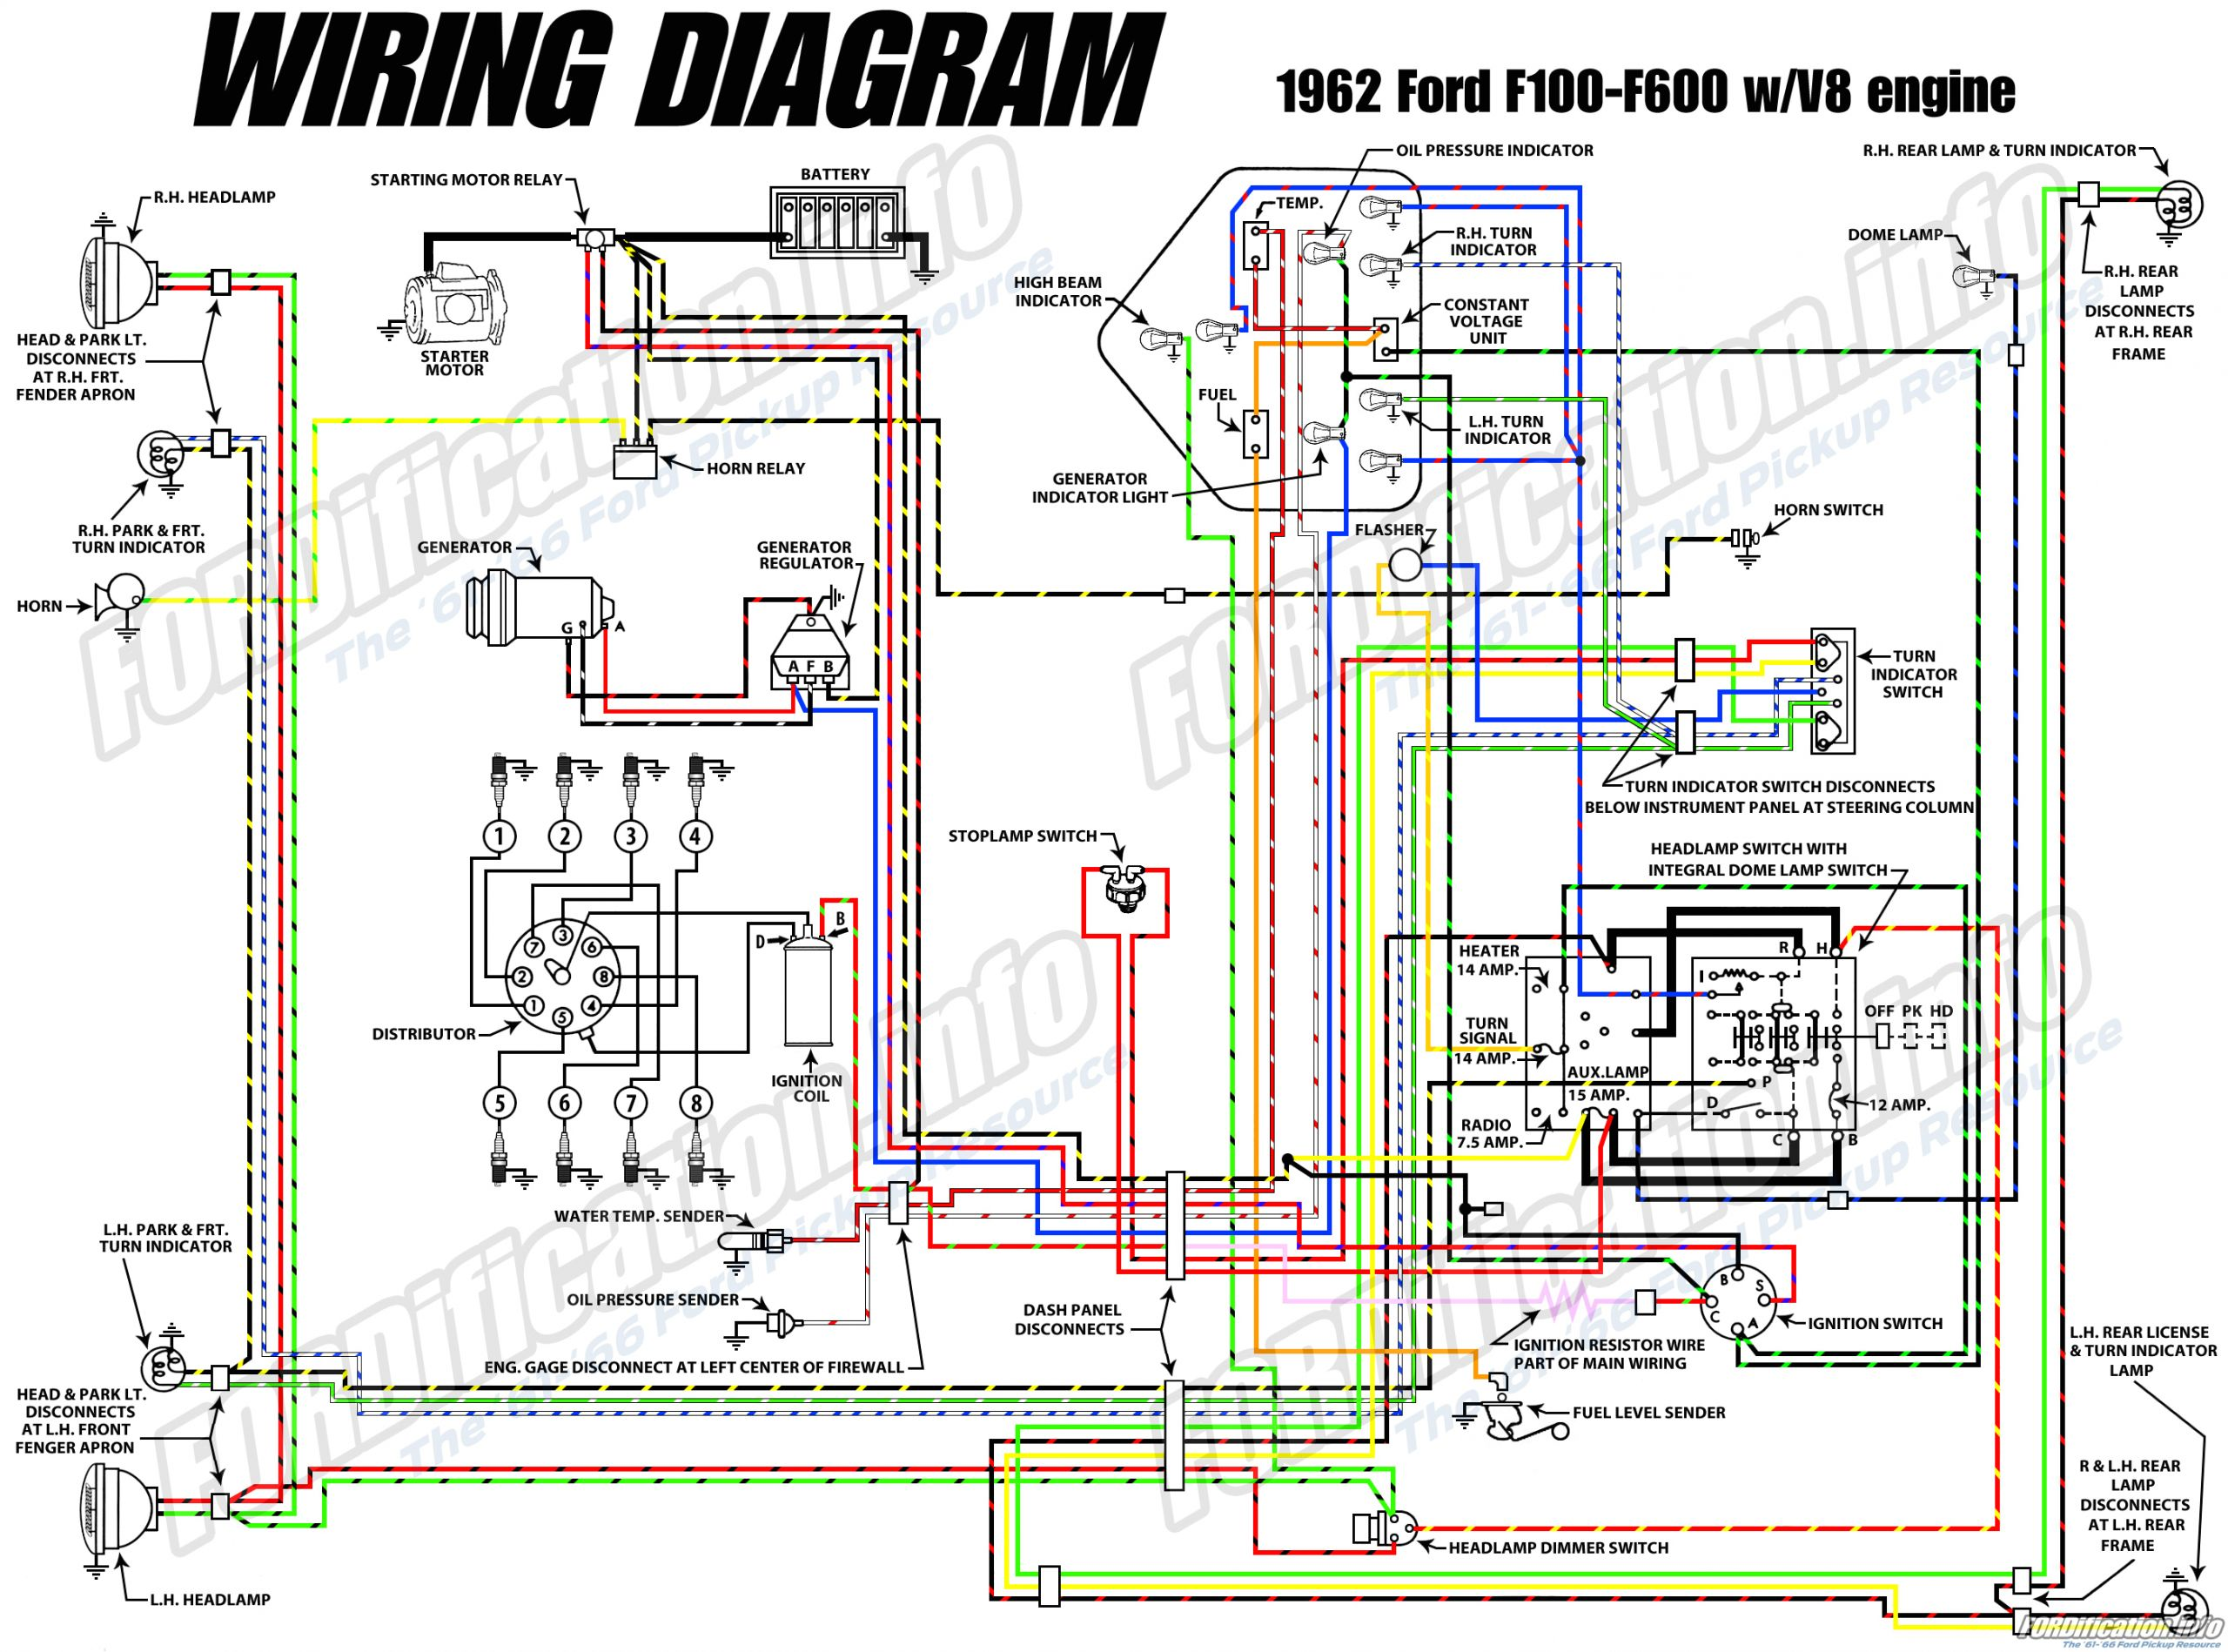 1962fordtruck masterwiring jpg